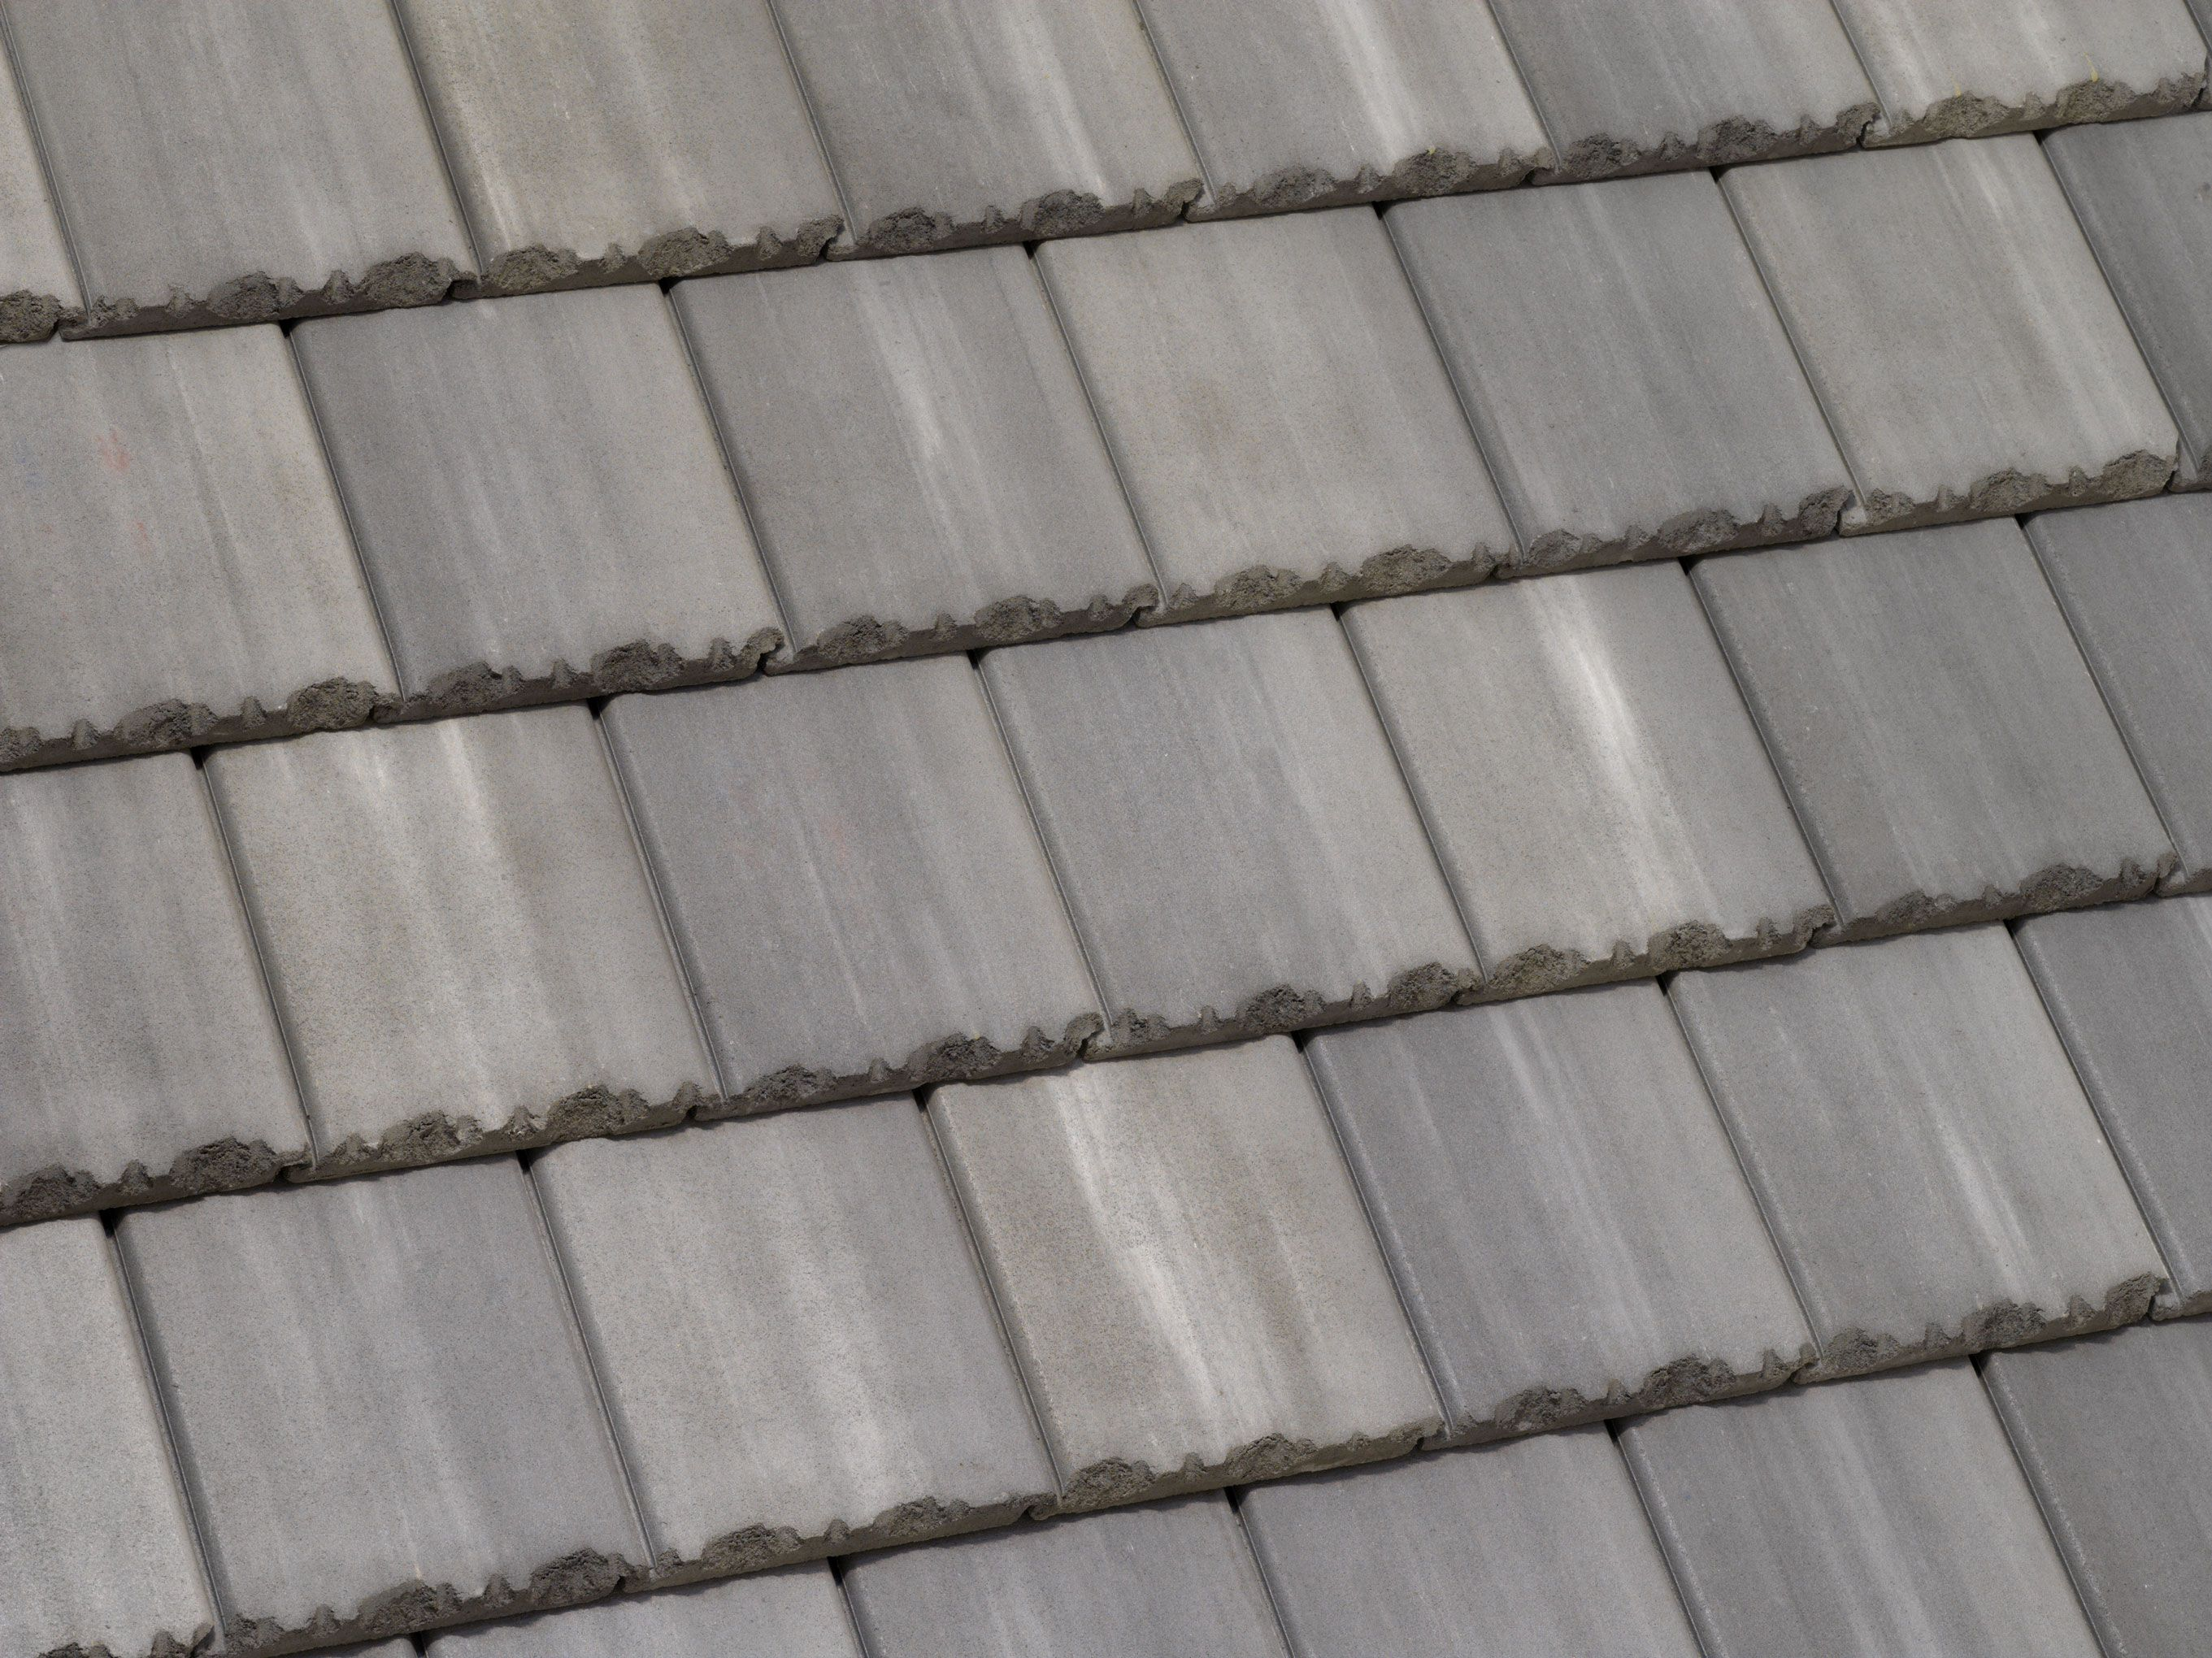 Roofing Slate Crossword